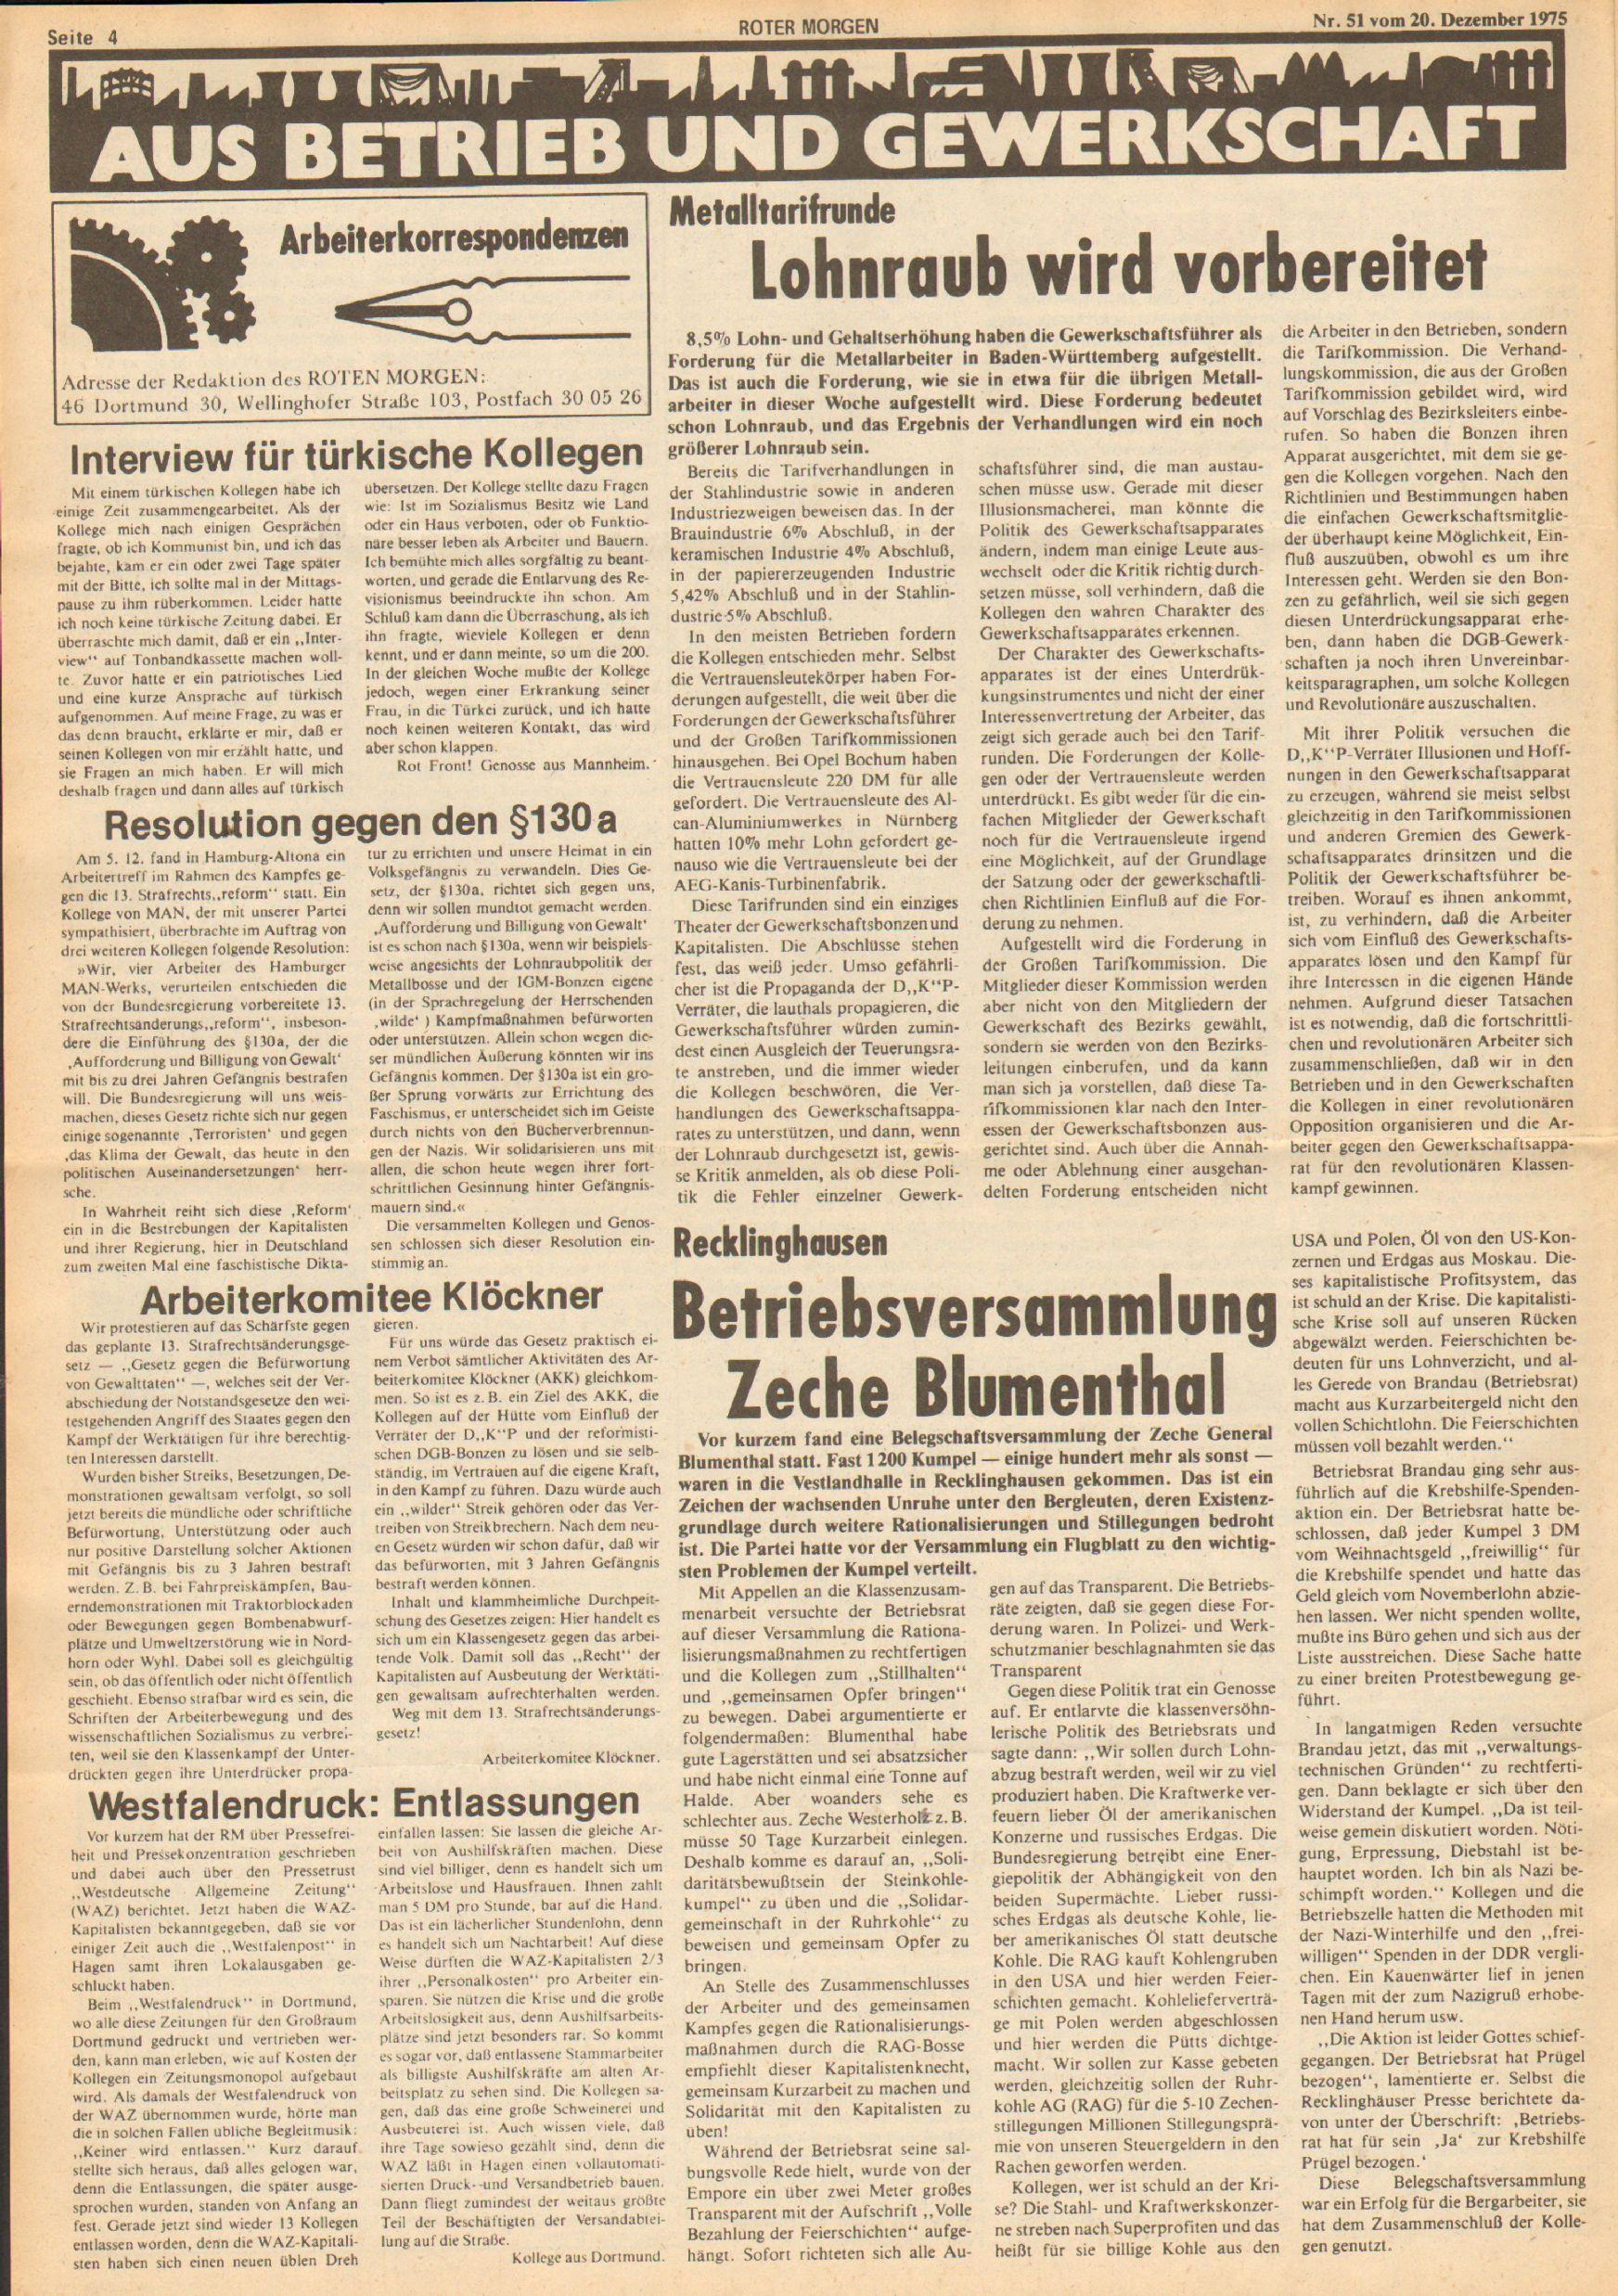 Roter Morgen, 9. Jg., 20. Dezember 1975, Nr. 51, Seite 4